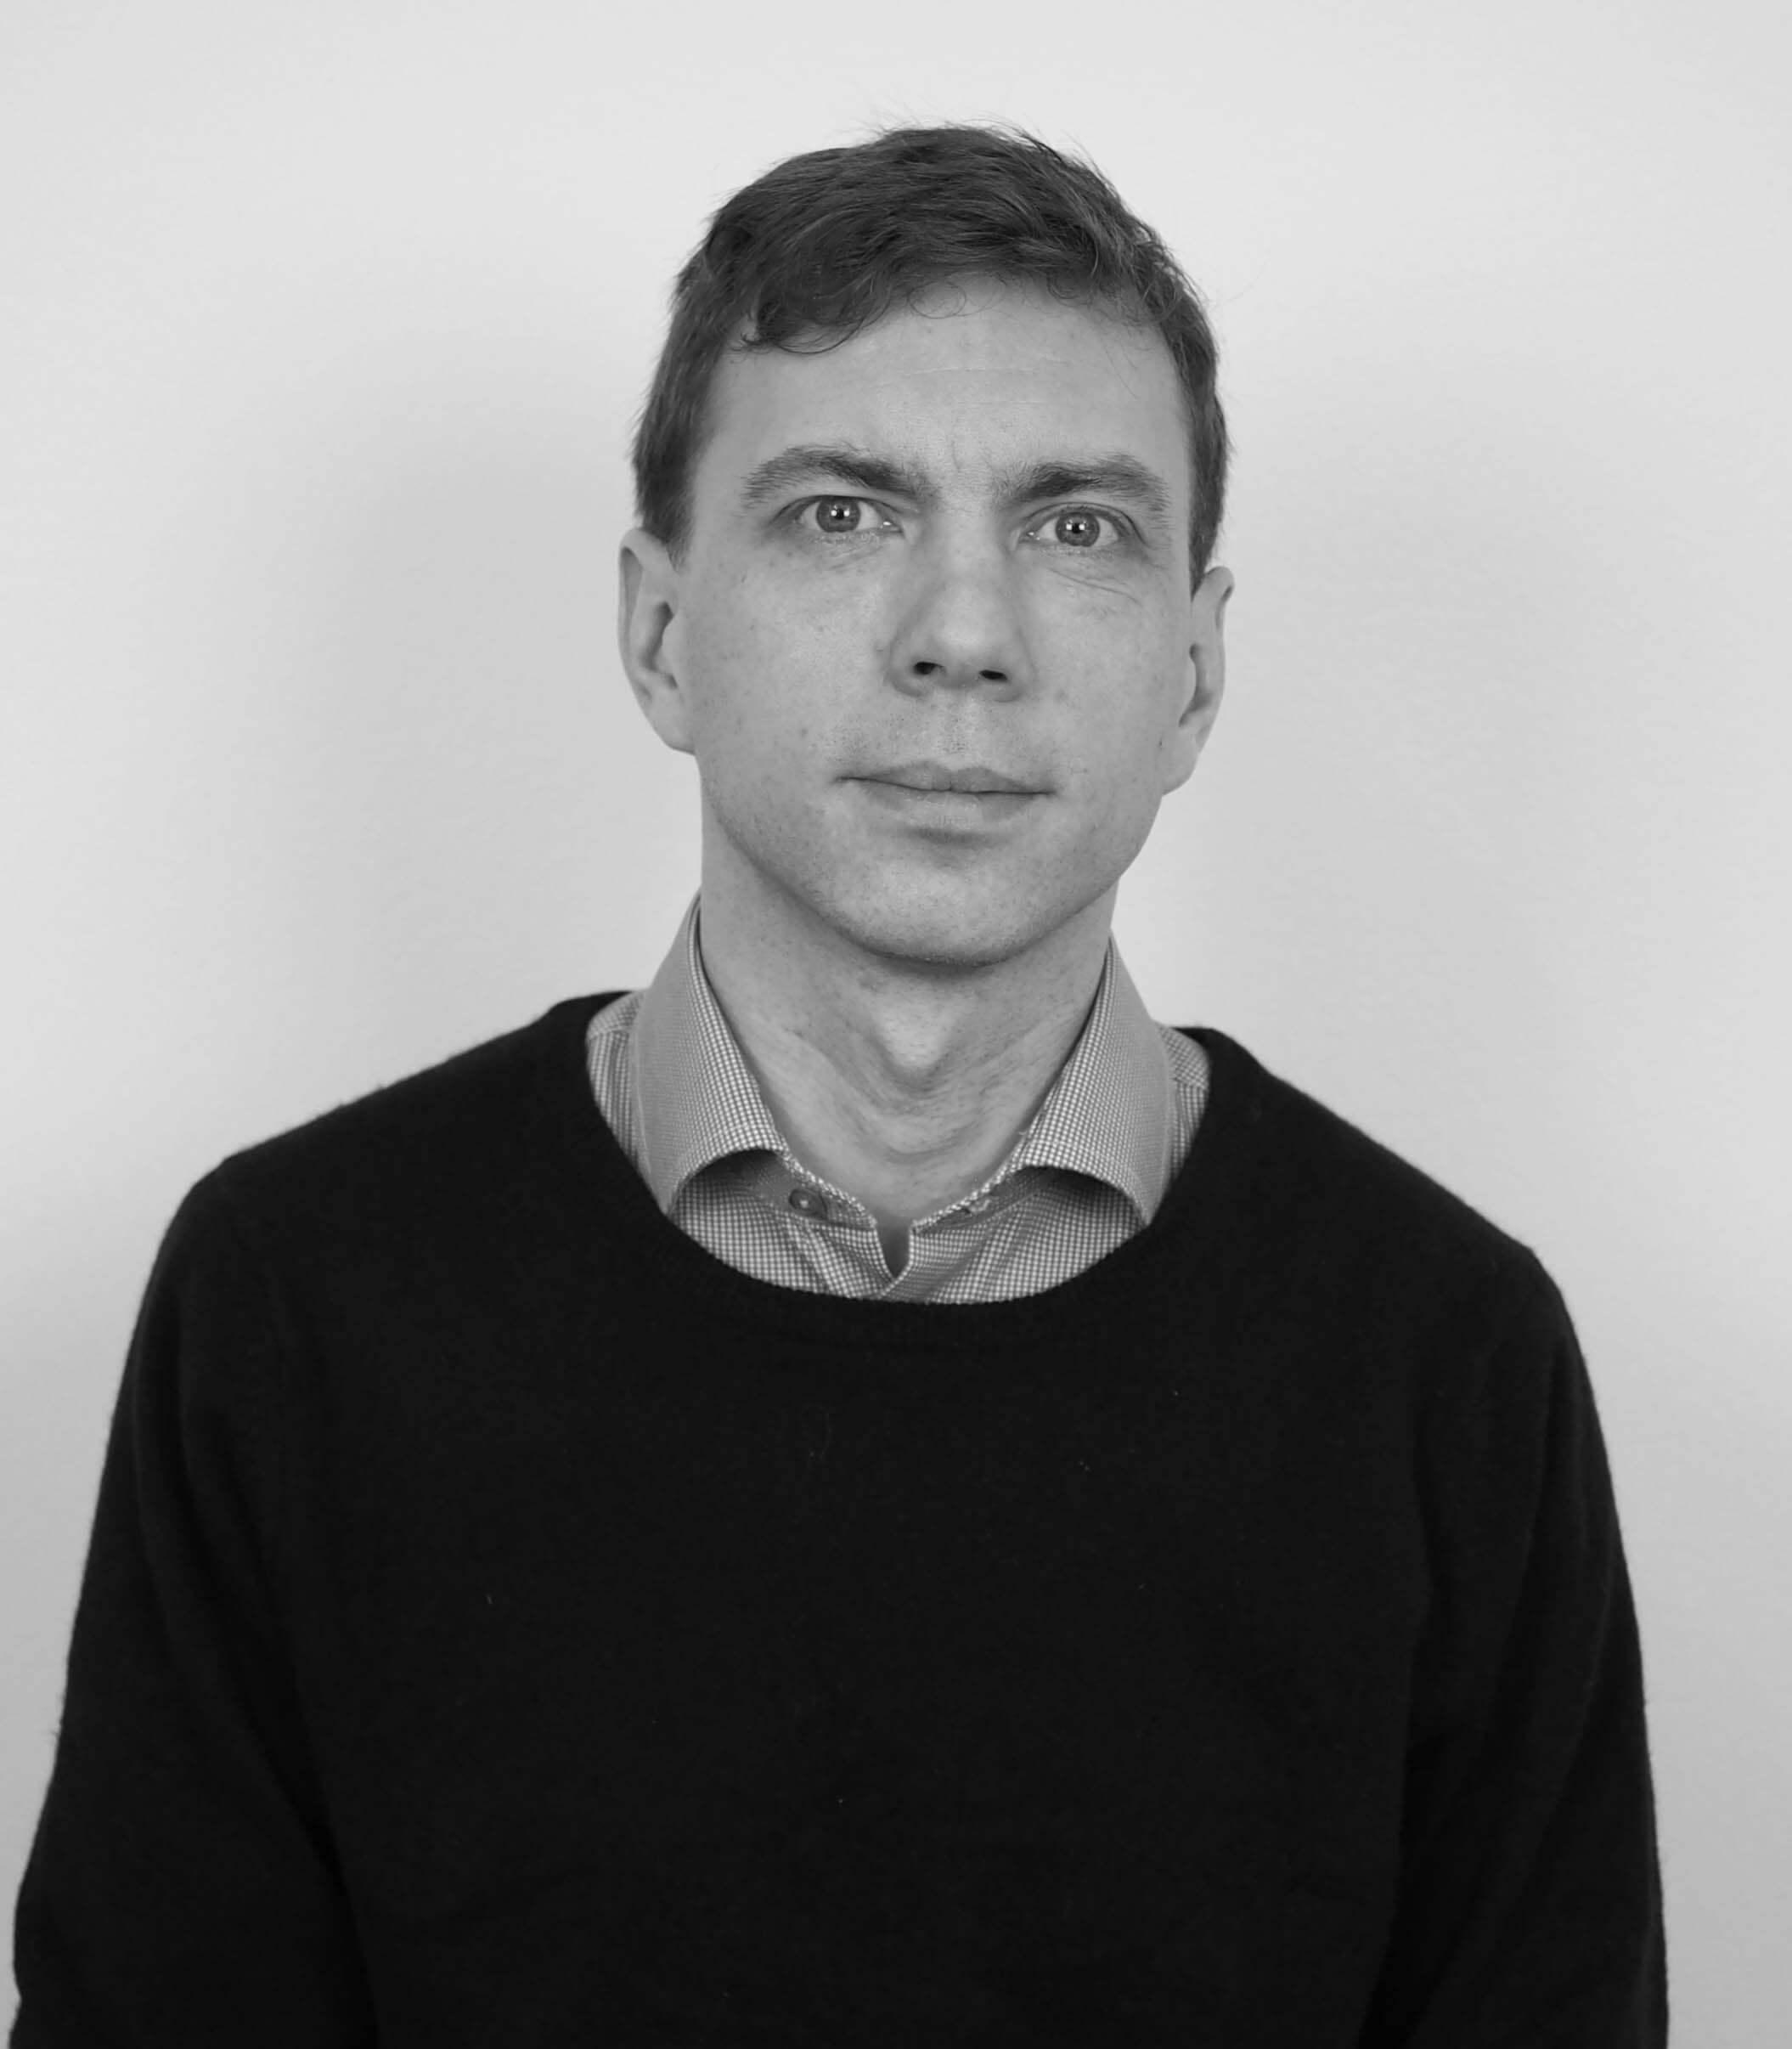 Antti Siren